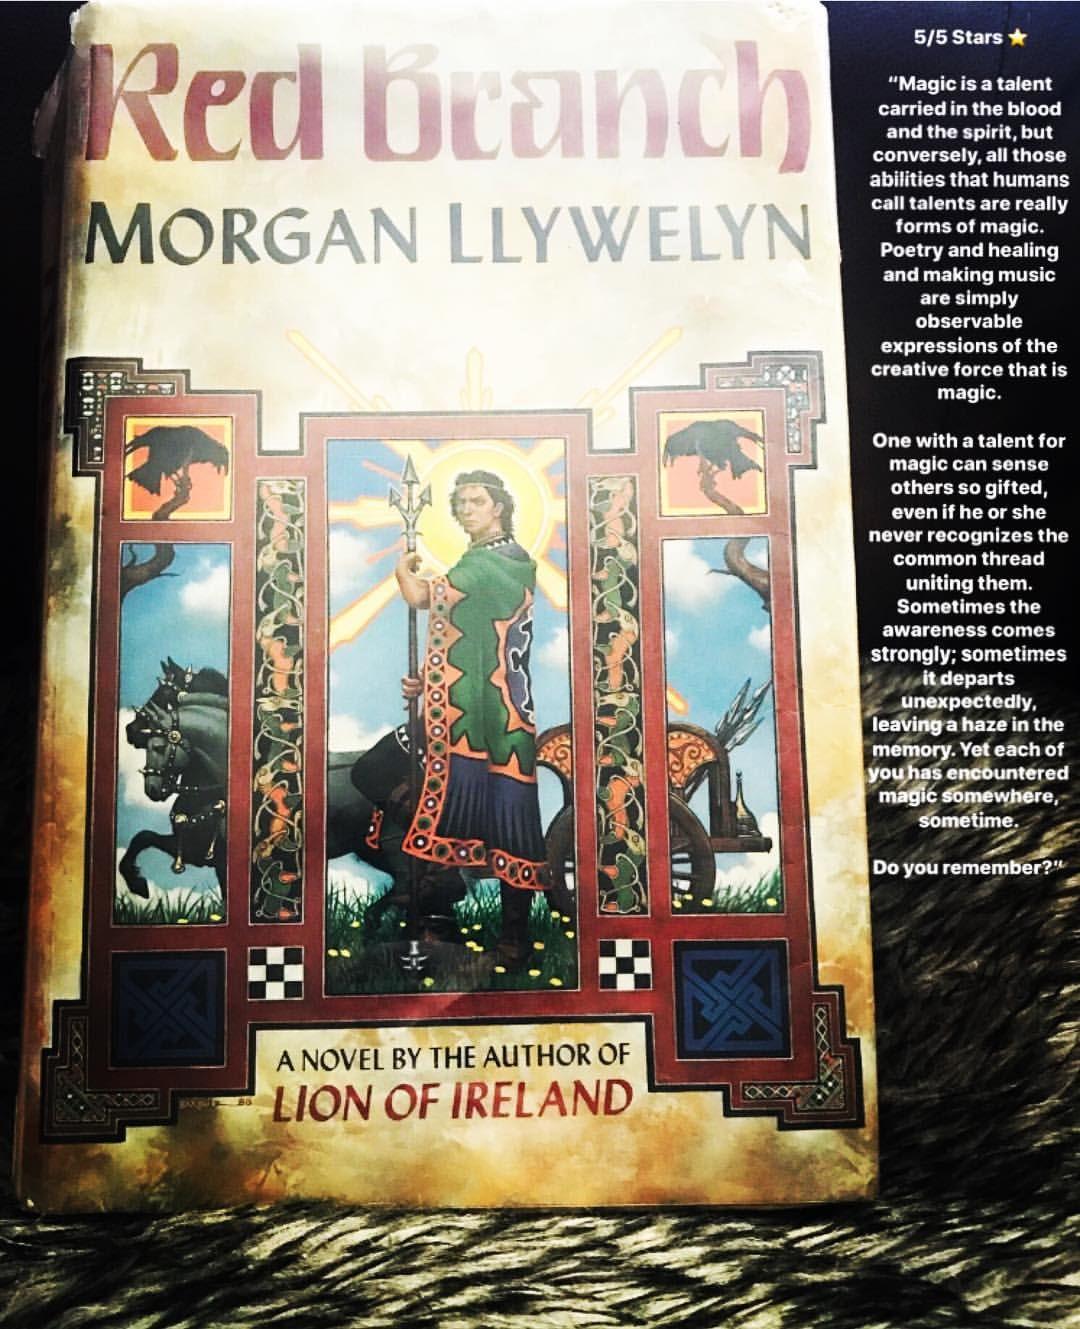 picture Morgan Llywelyn